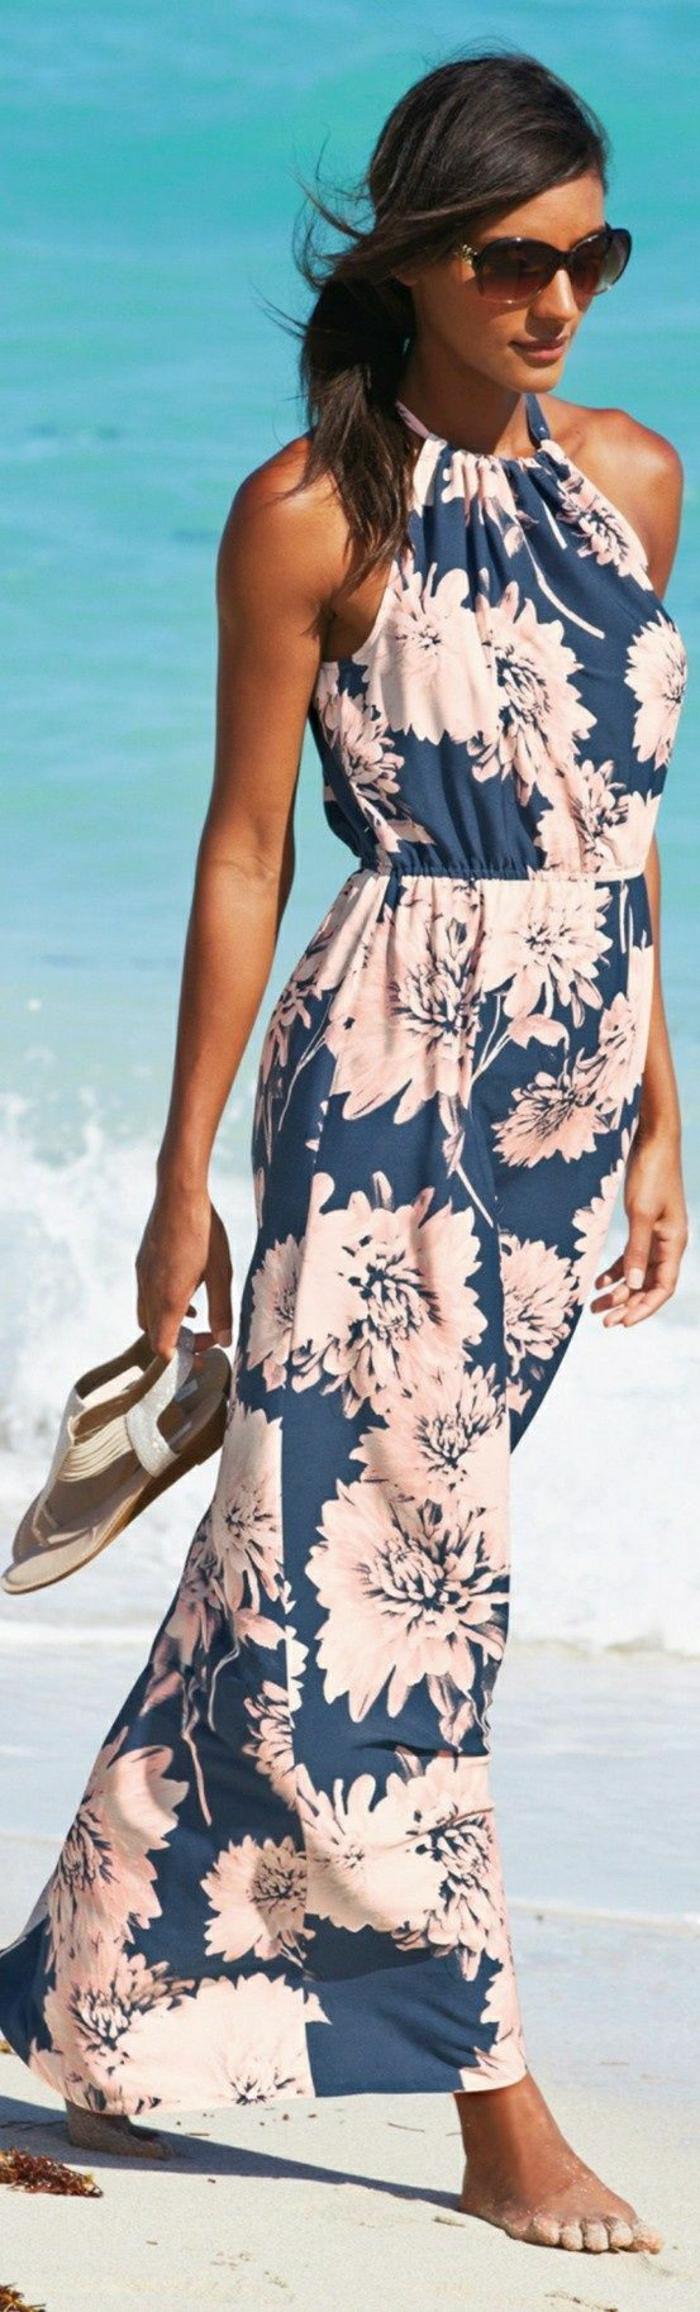 Strand-langes-Sommerkleid-blau-rosige-Blumen-Sandalen-Sonnenbrille